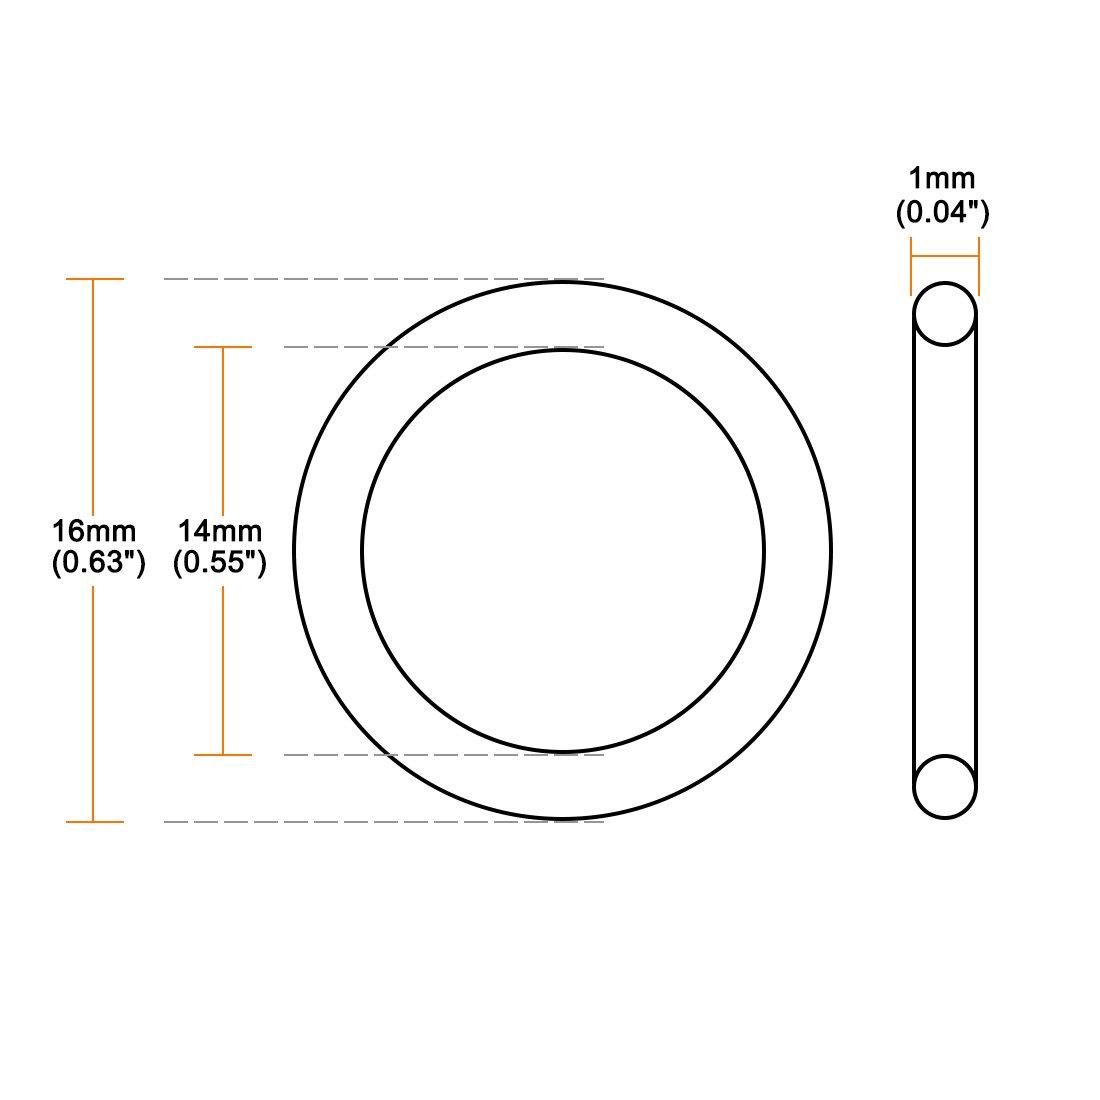 sourcing map 20pcs O-Ringe Nitrilkautschuk Gummi 3mm x 5mm x 1mm Dichtungsringe Dichtung DE de